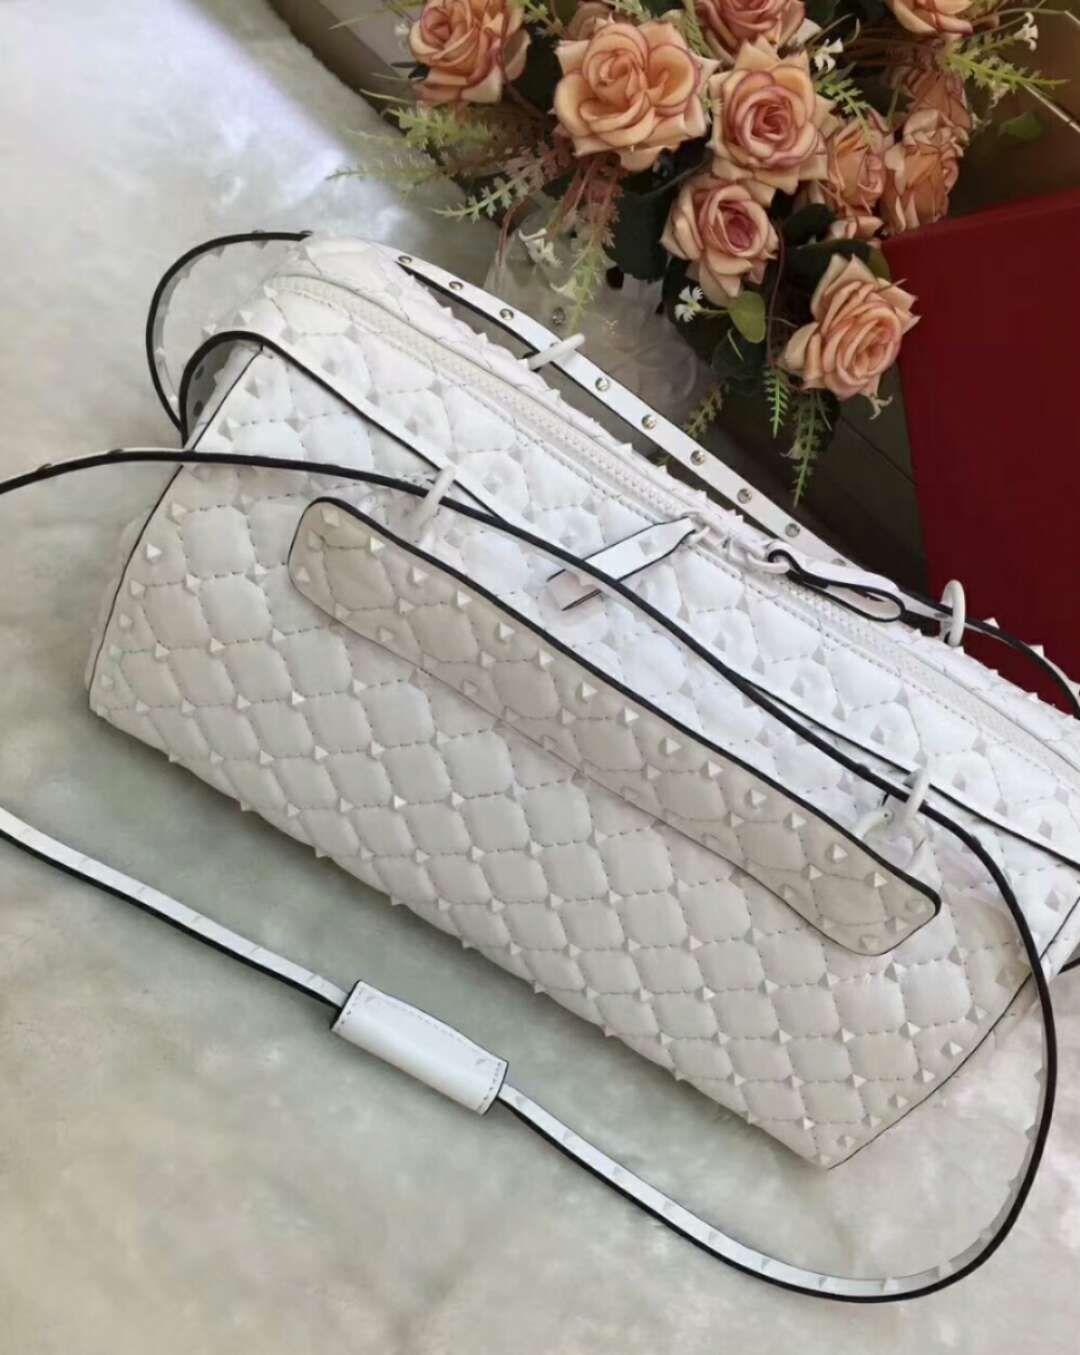 2018 sheep skin genuine leather high fashion show handbag OL diamond lattice metallic rivet pillow trunk bag party full starts big size 33cm